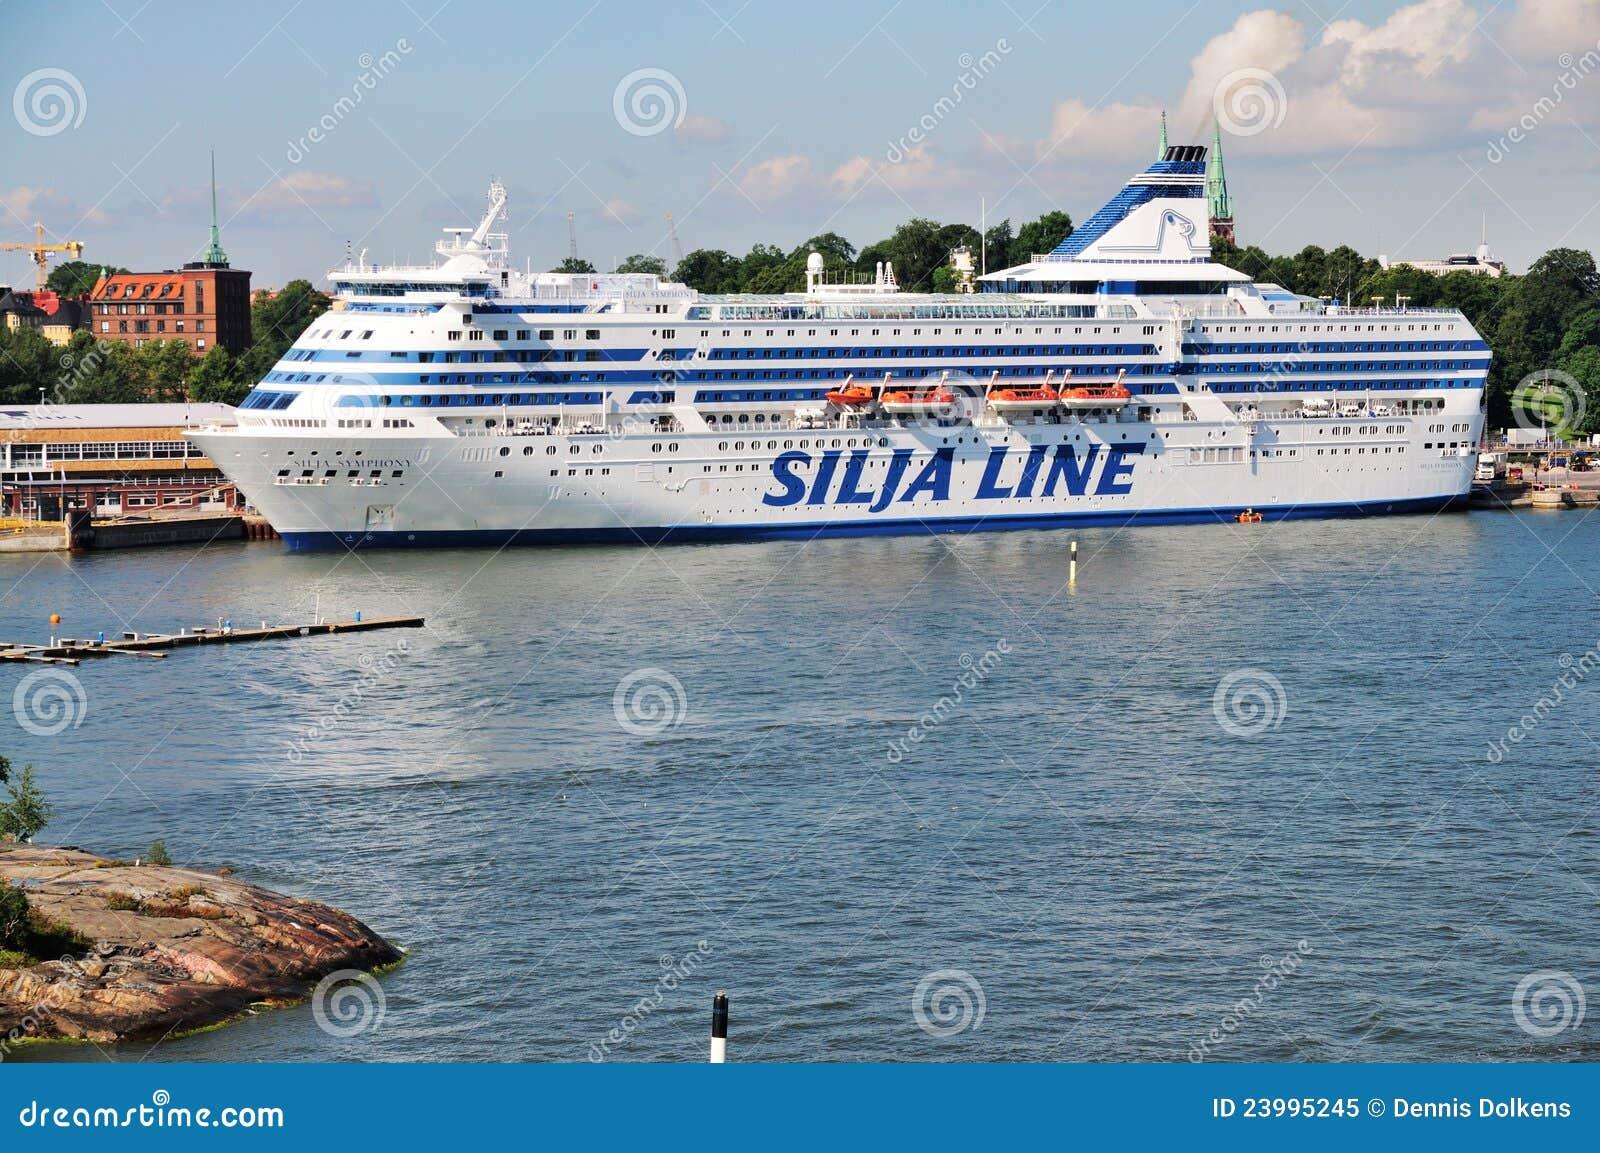 Silja Line In The Harbor Of Helsinki, Finland. Editorial Image - Image: 23995245